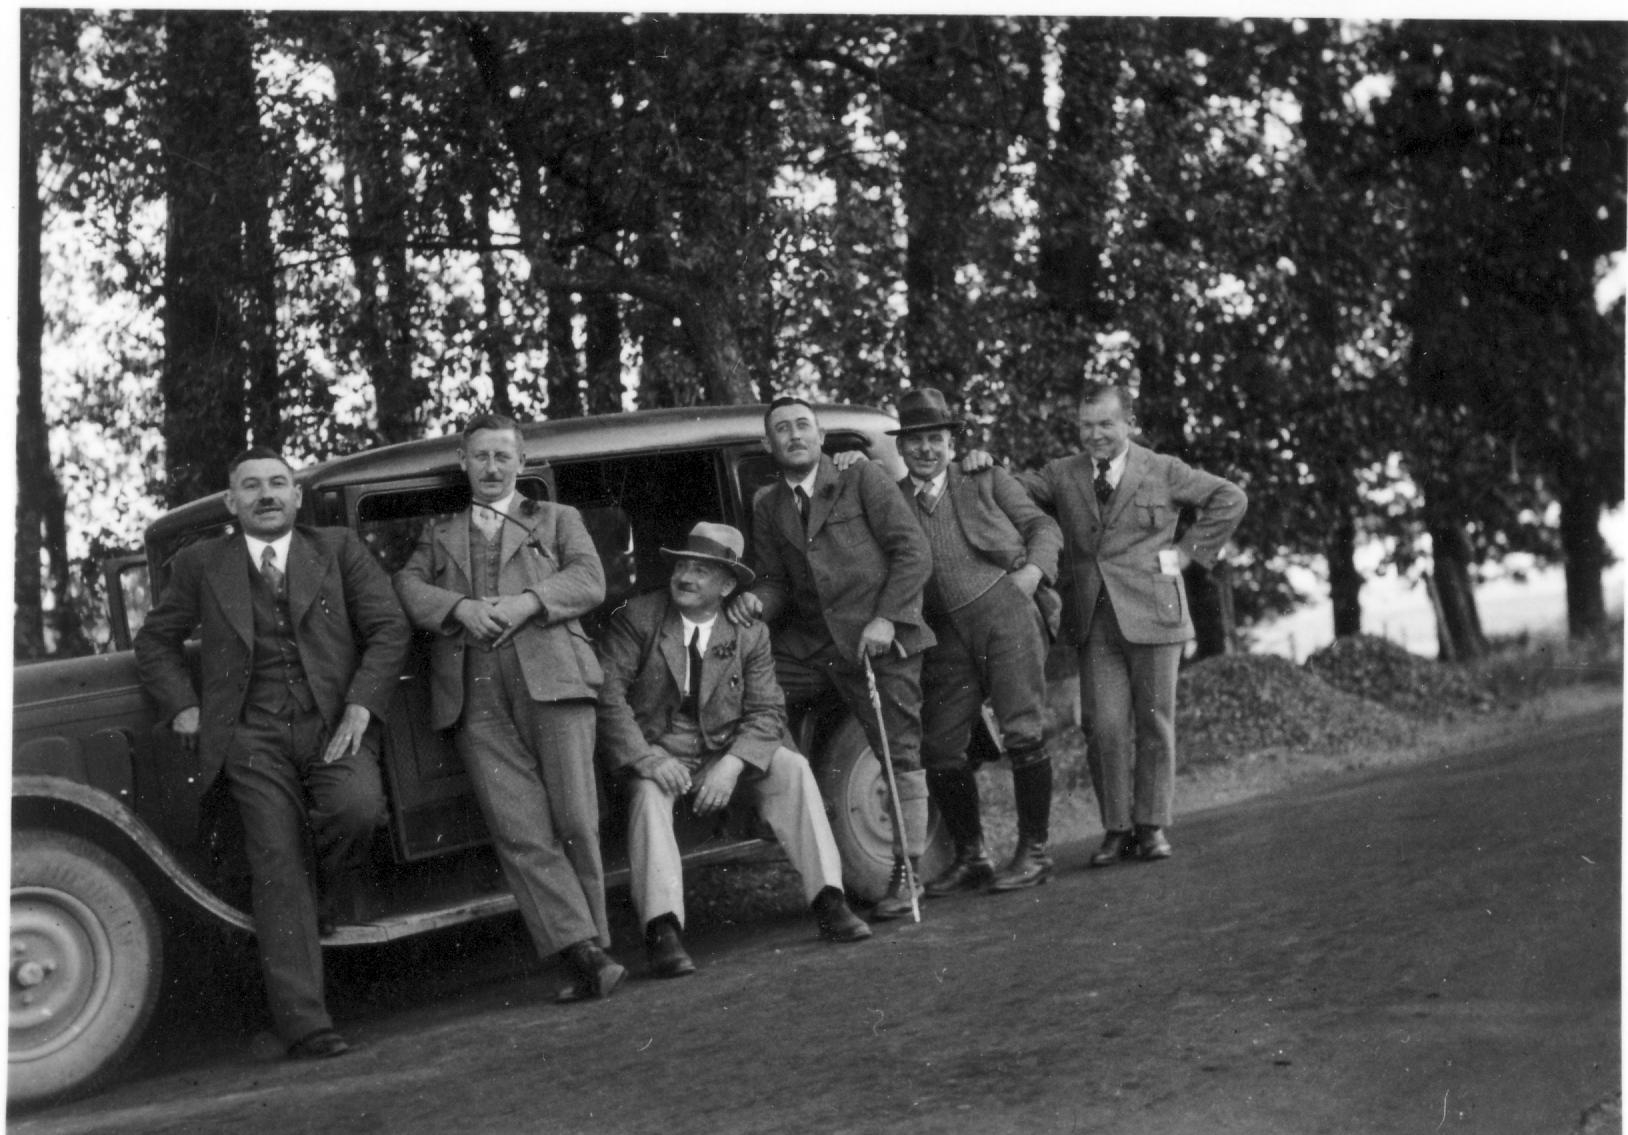 Personengruppe mit Auto